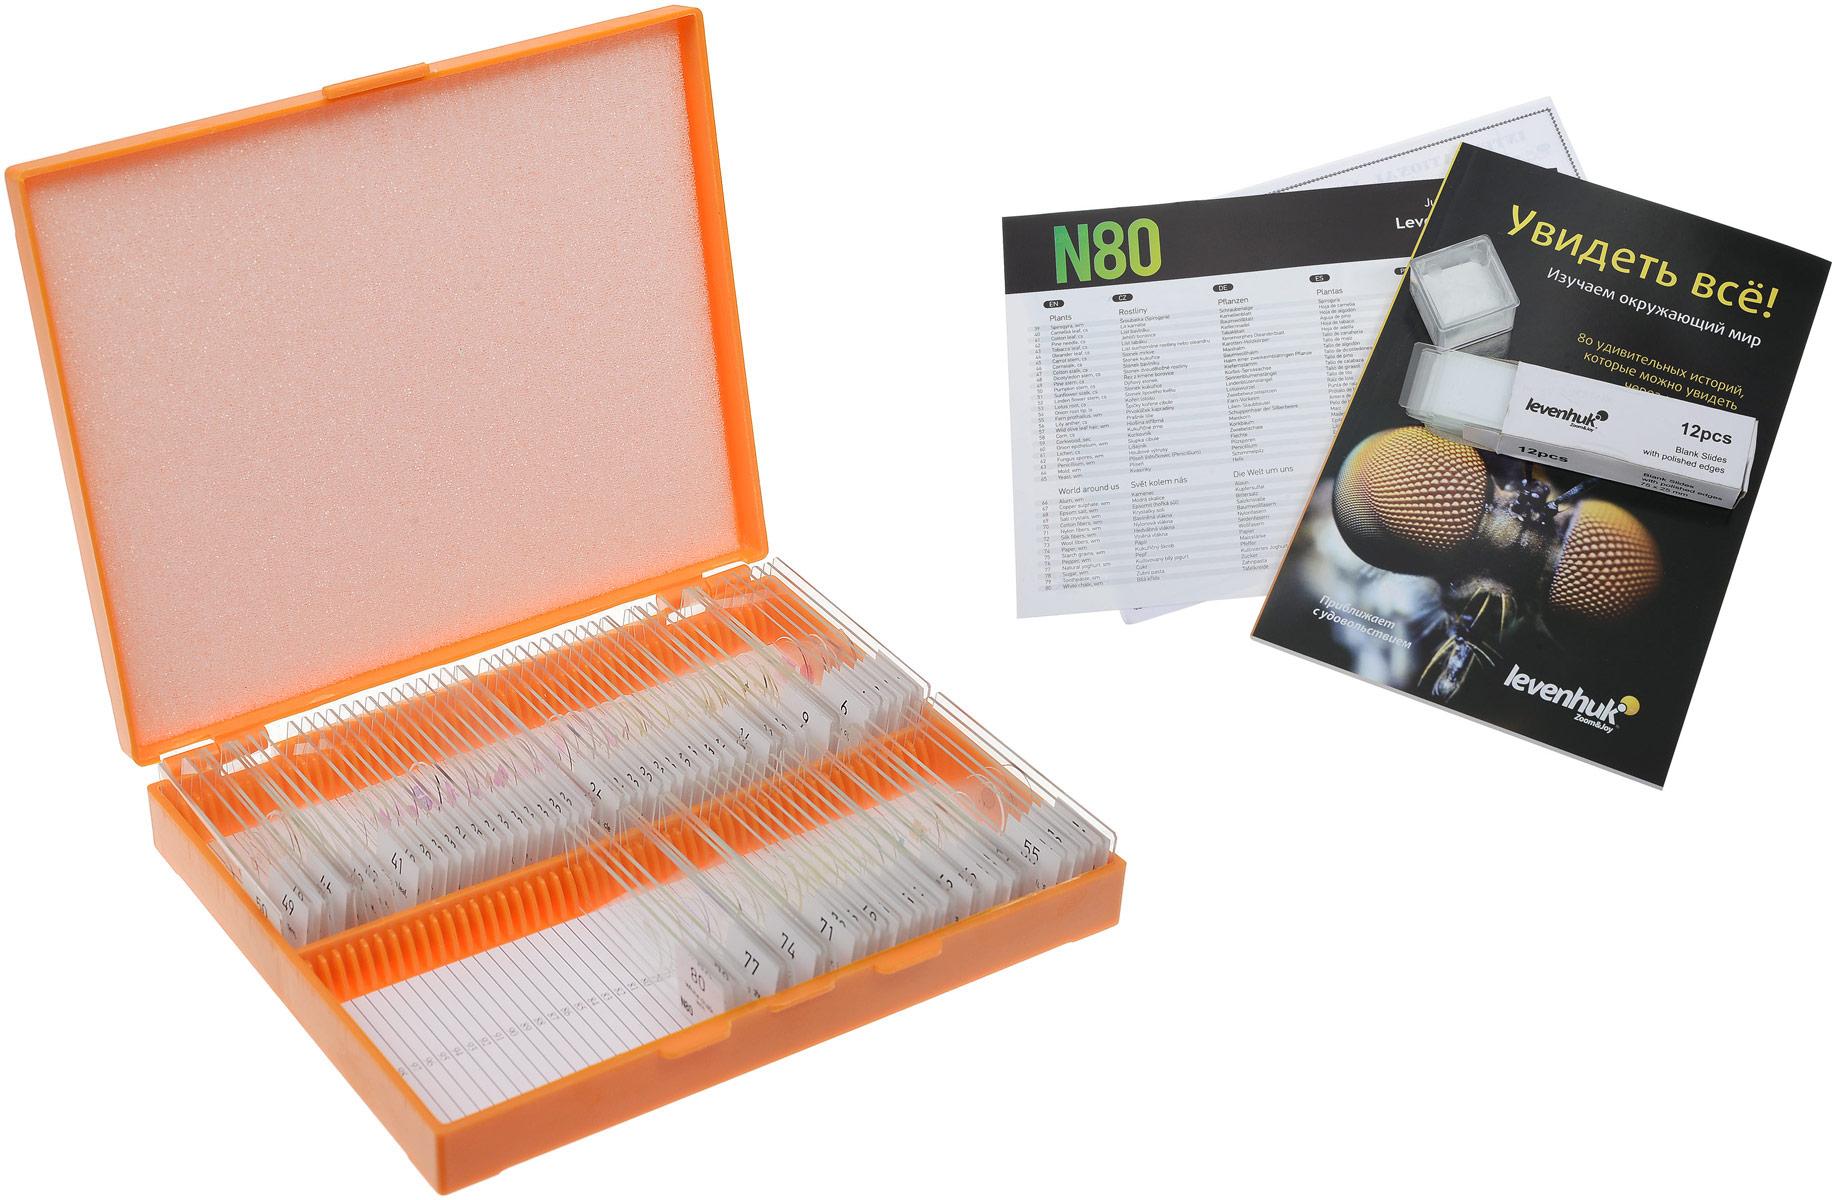 Levenhuk N80 NG